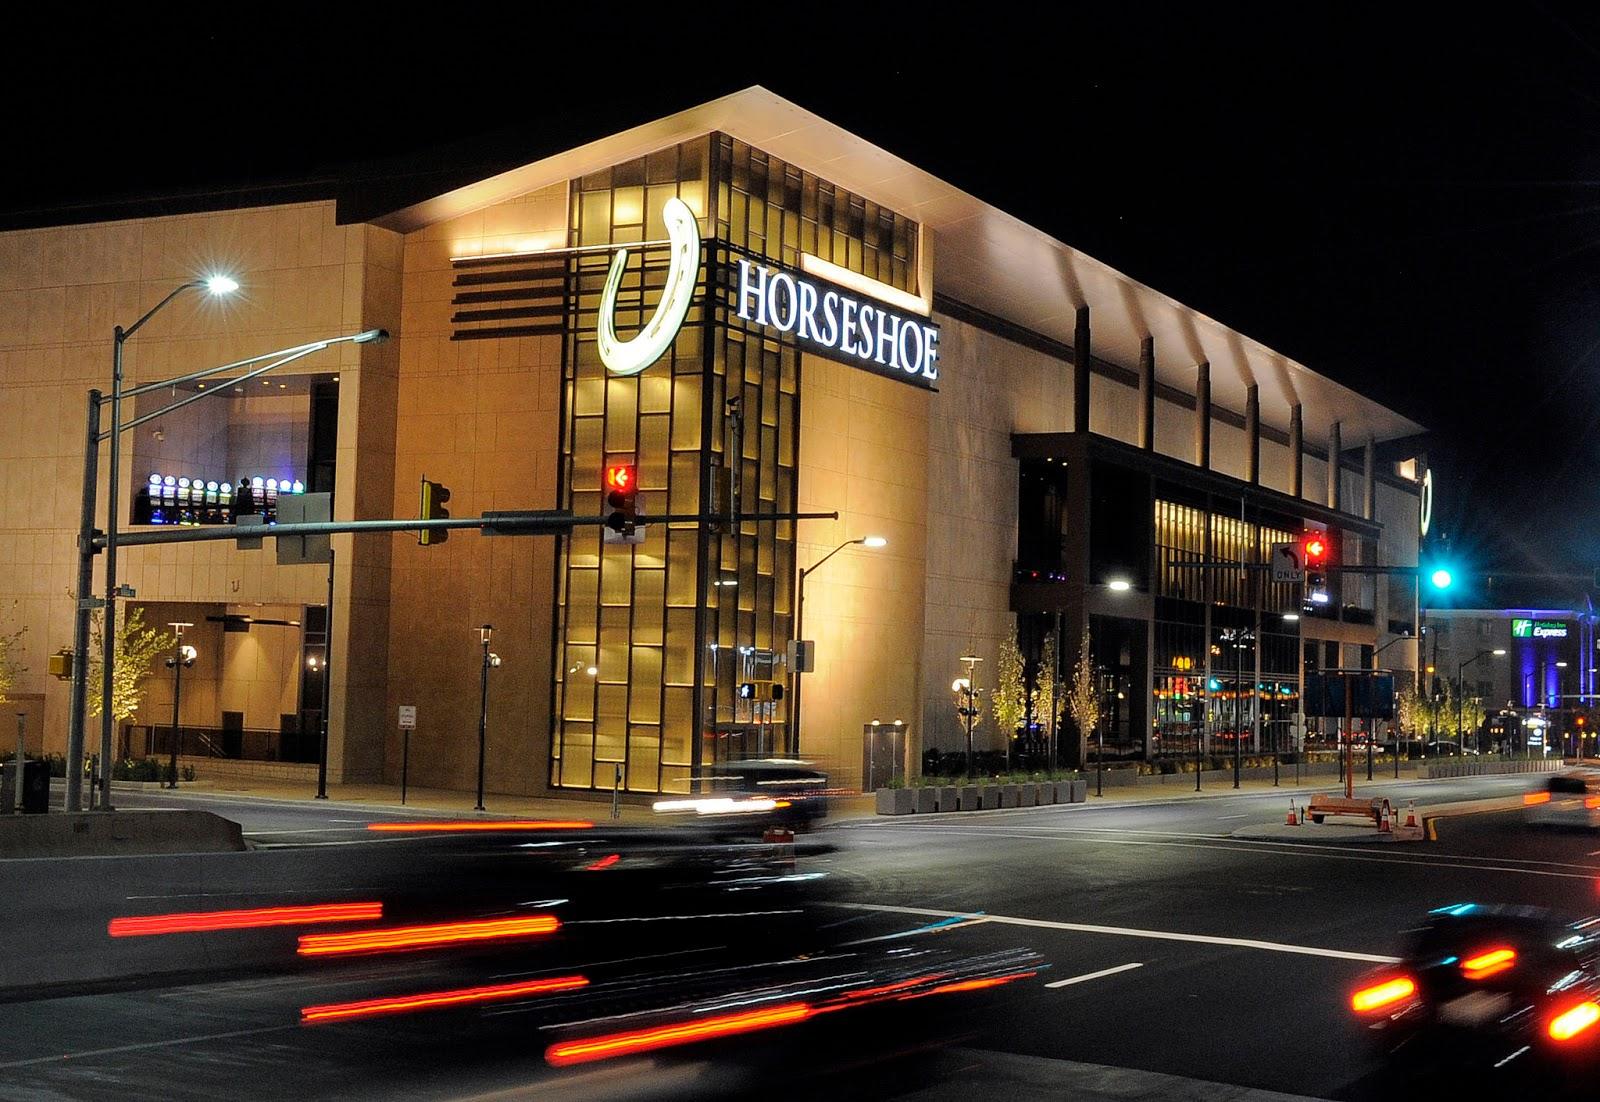 Horseshoe casino sweepstakes